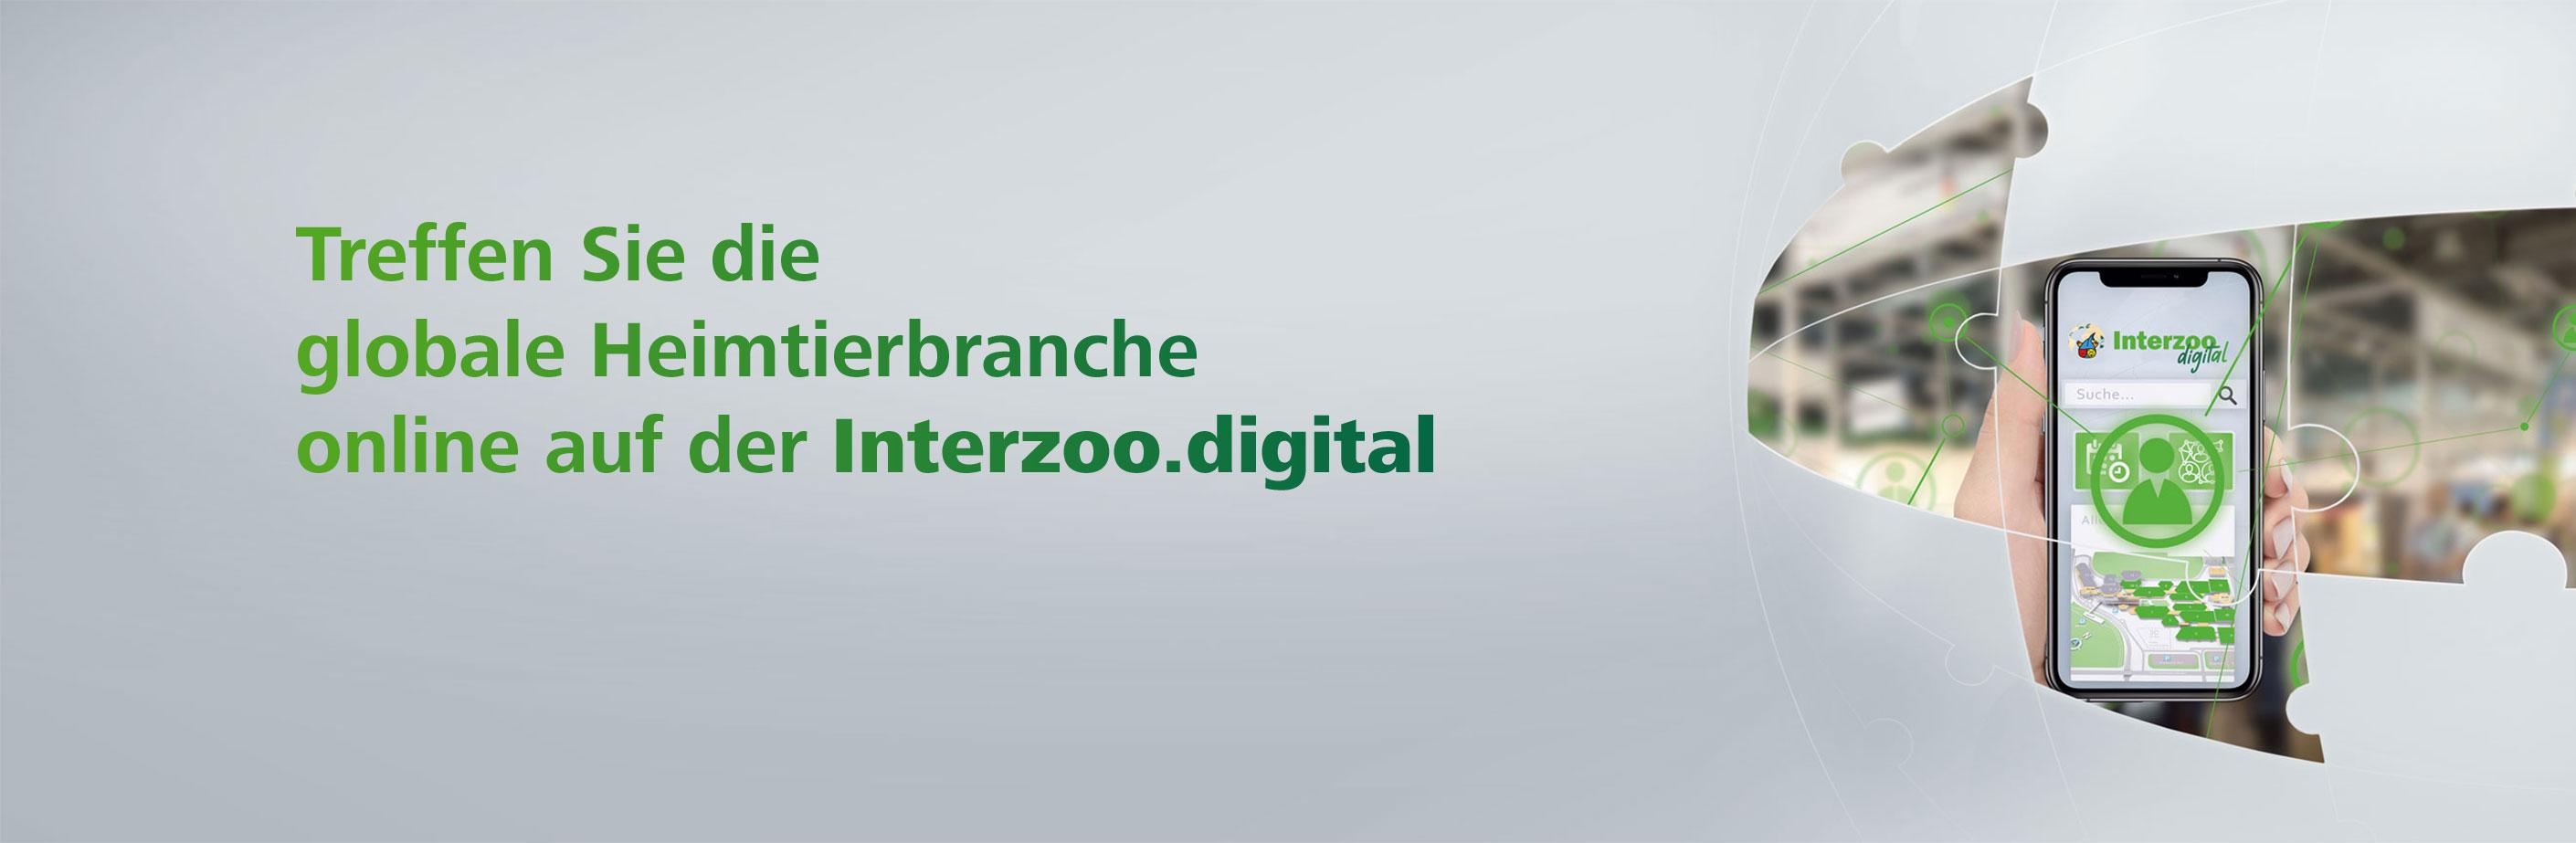 Interzoo.digital